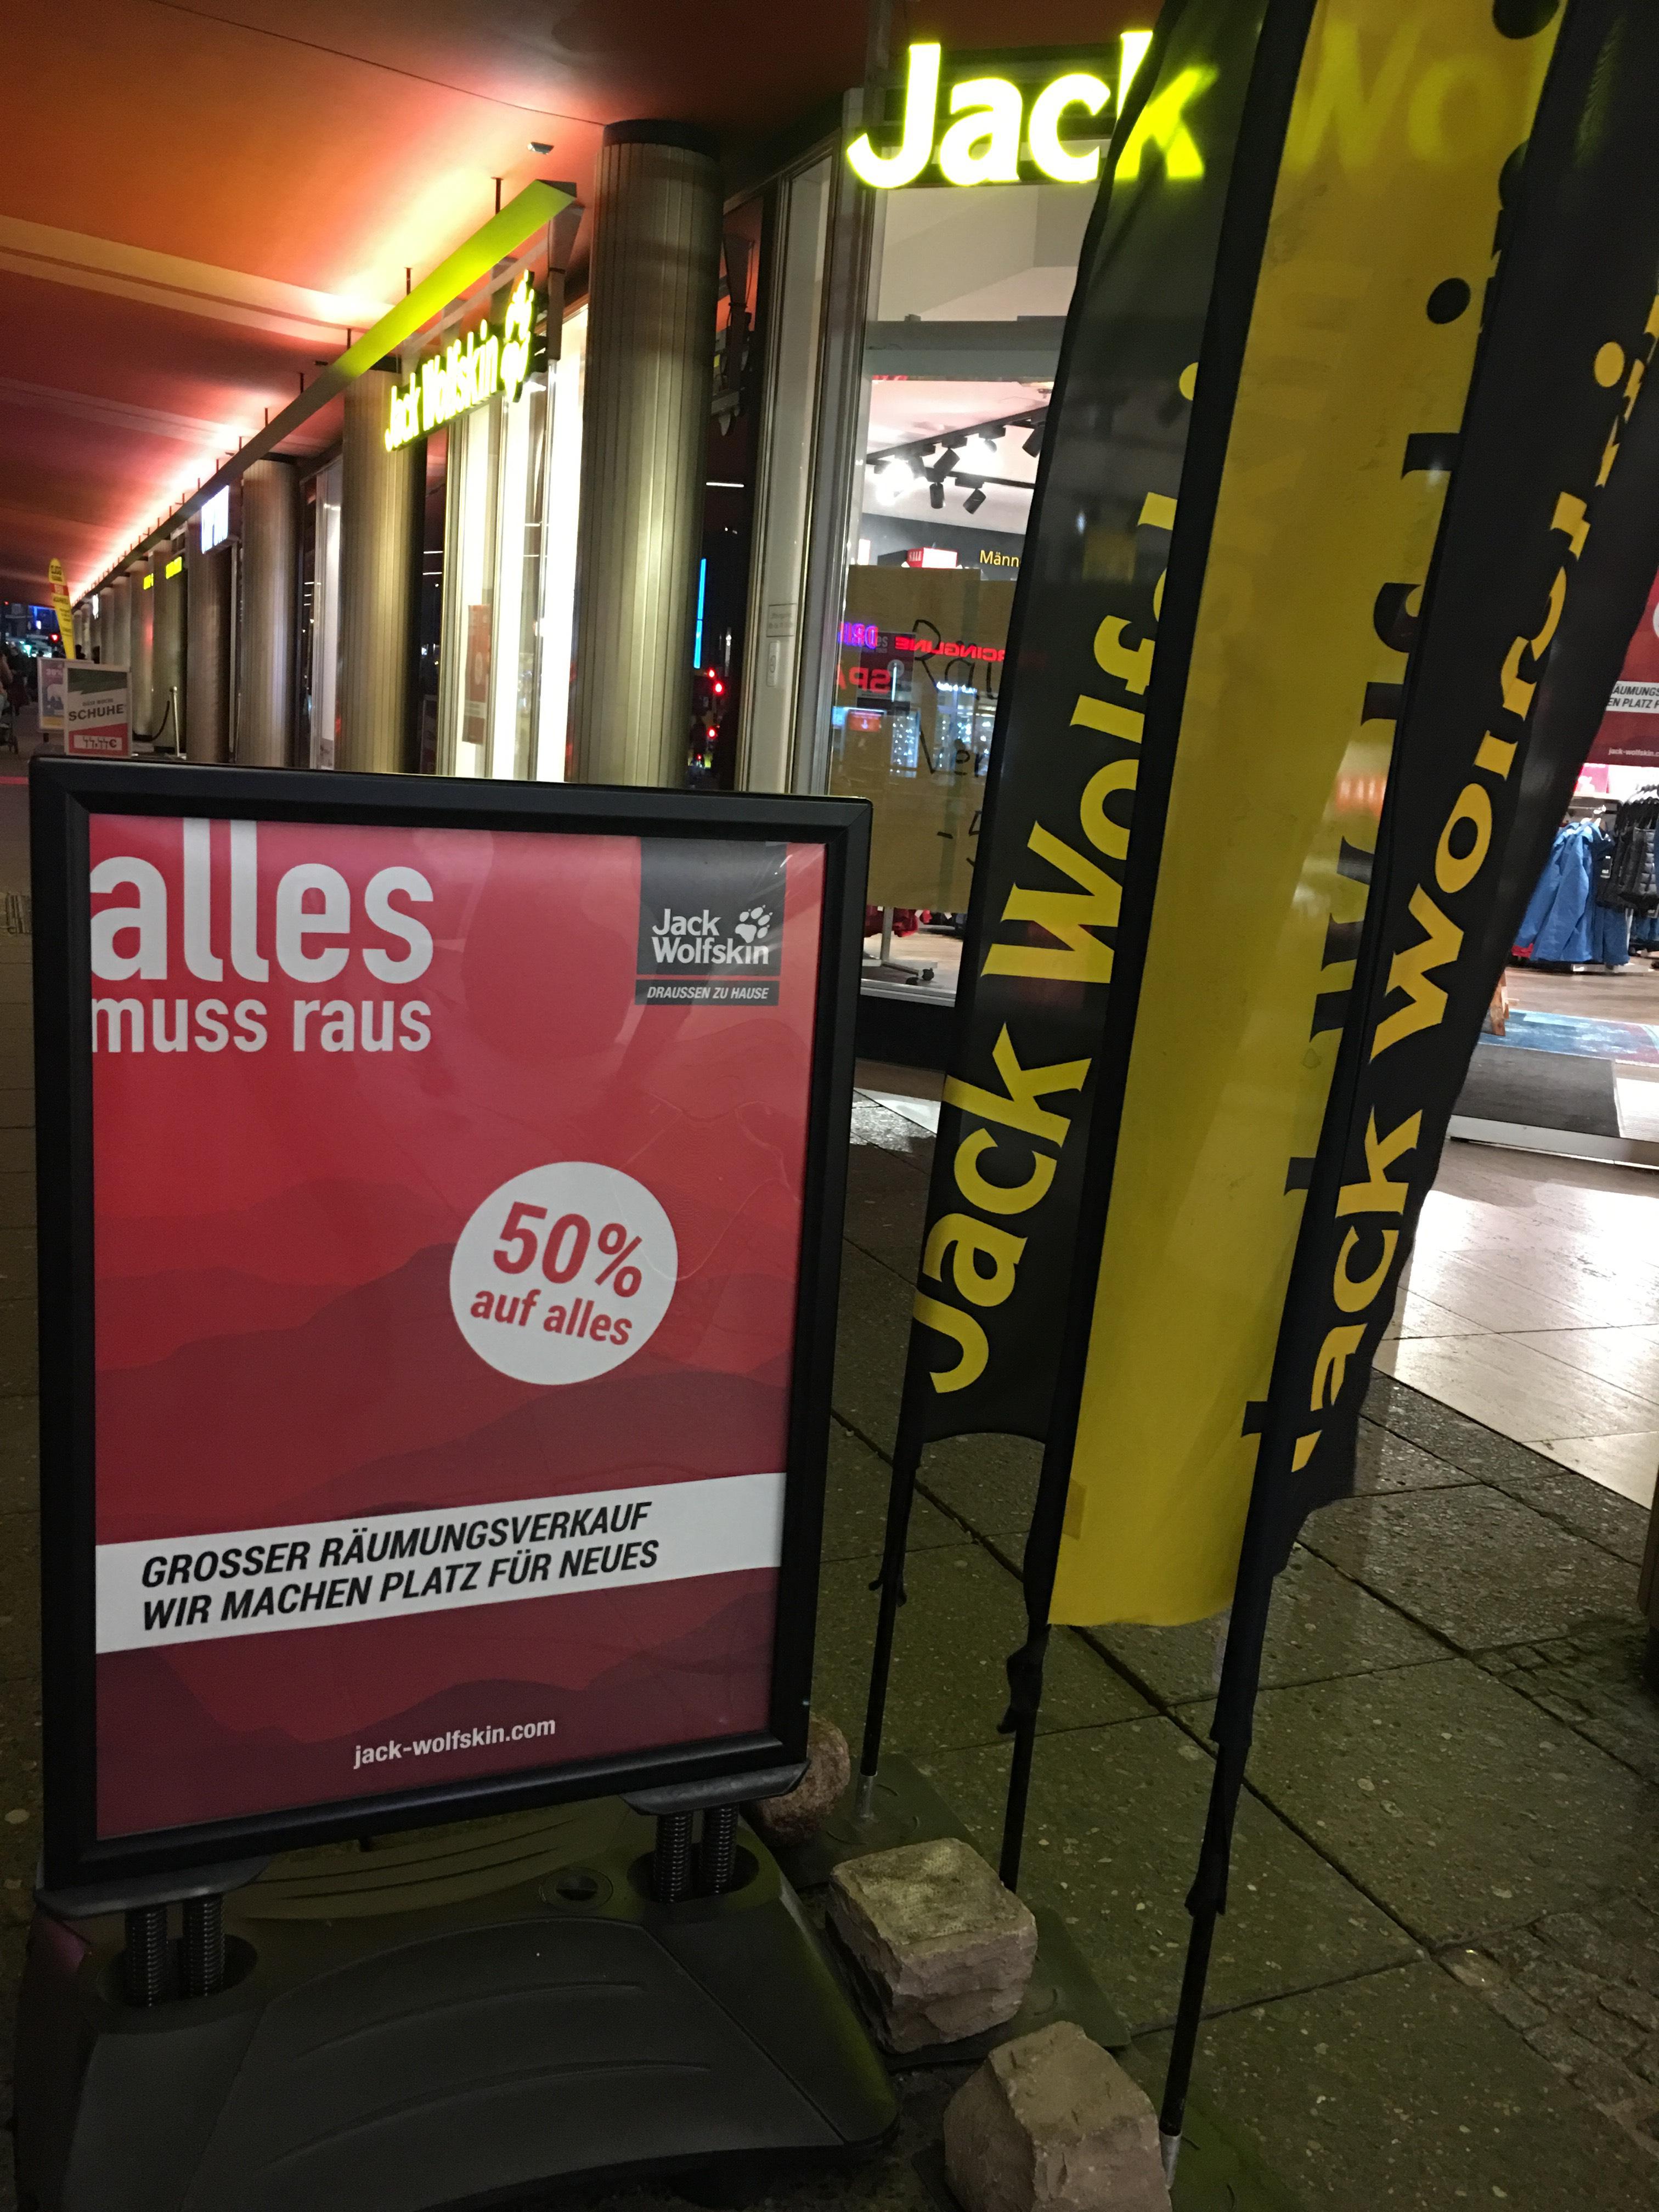 (Lokal) 50% auf alles Jack Wolfskin am Ku'damm in Berlin